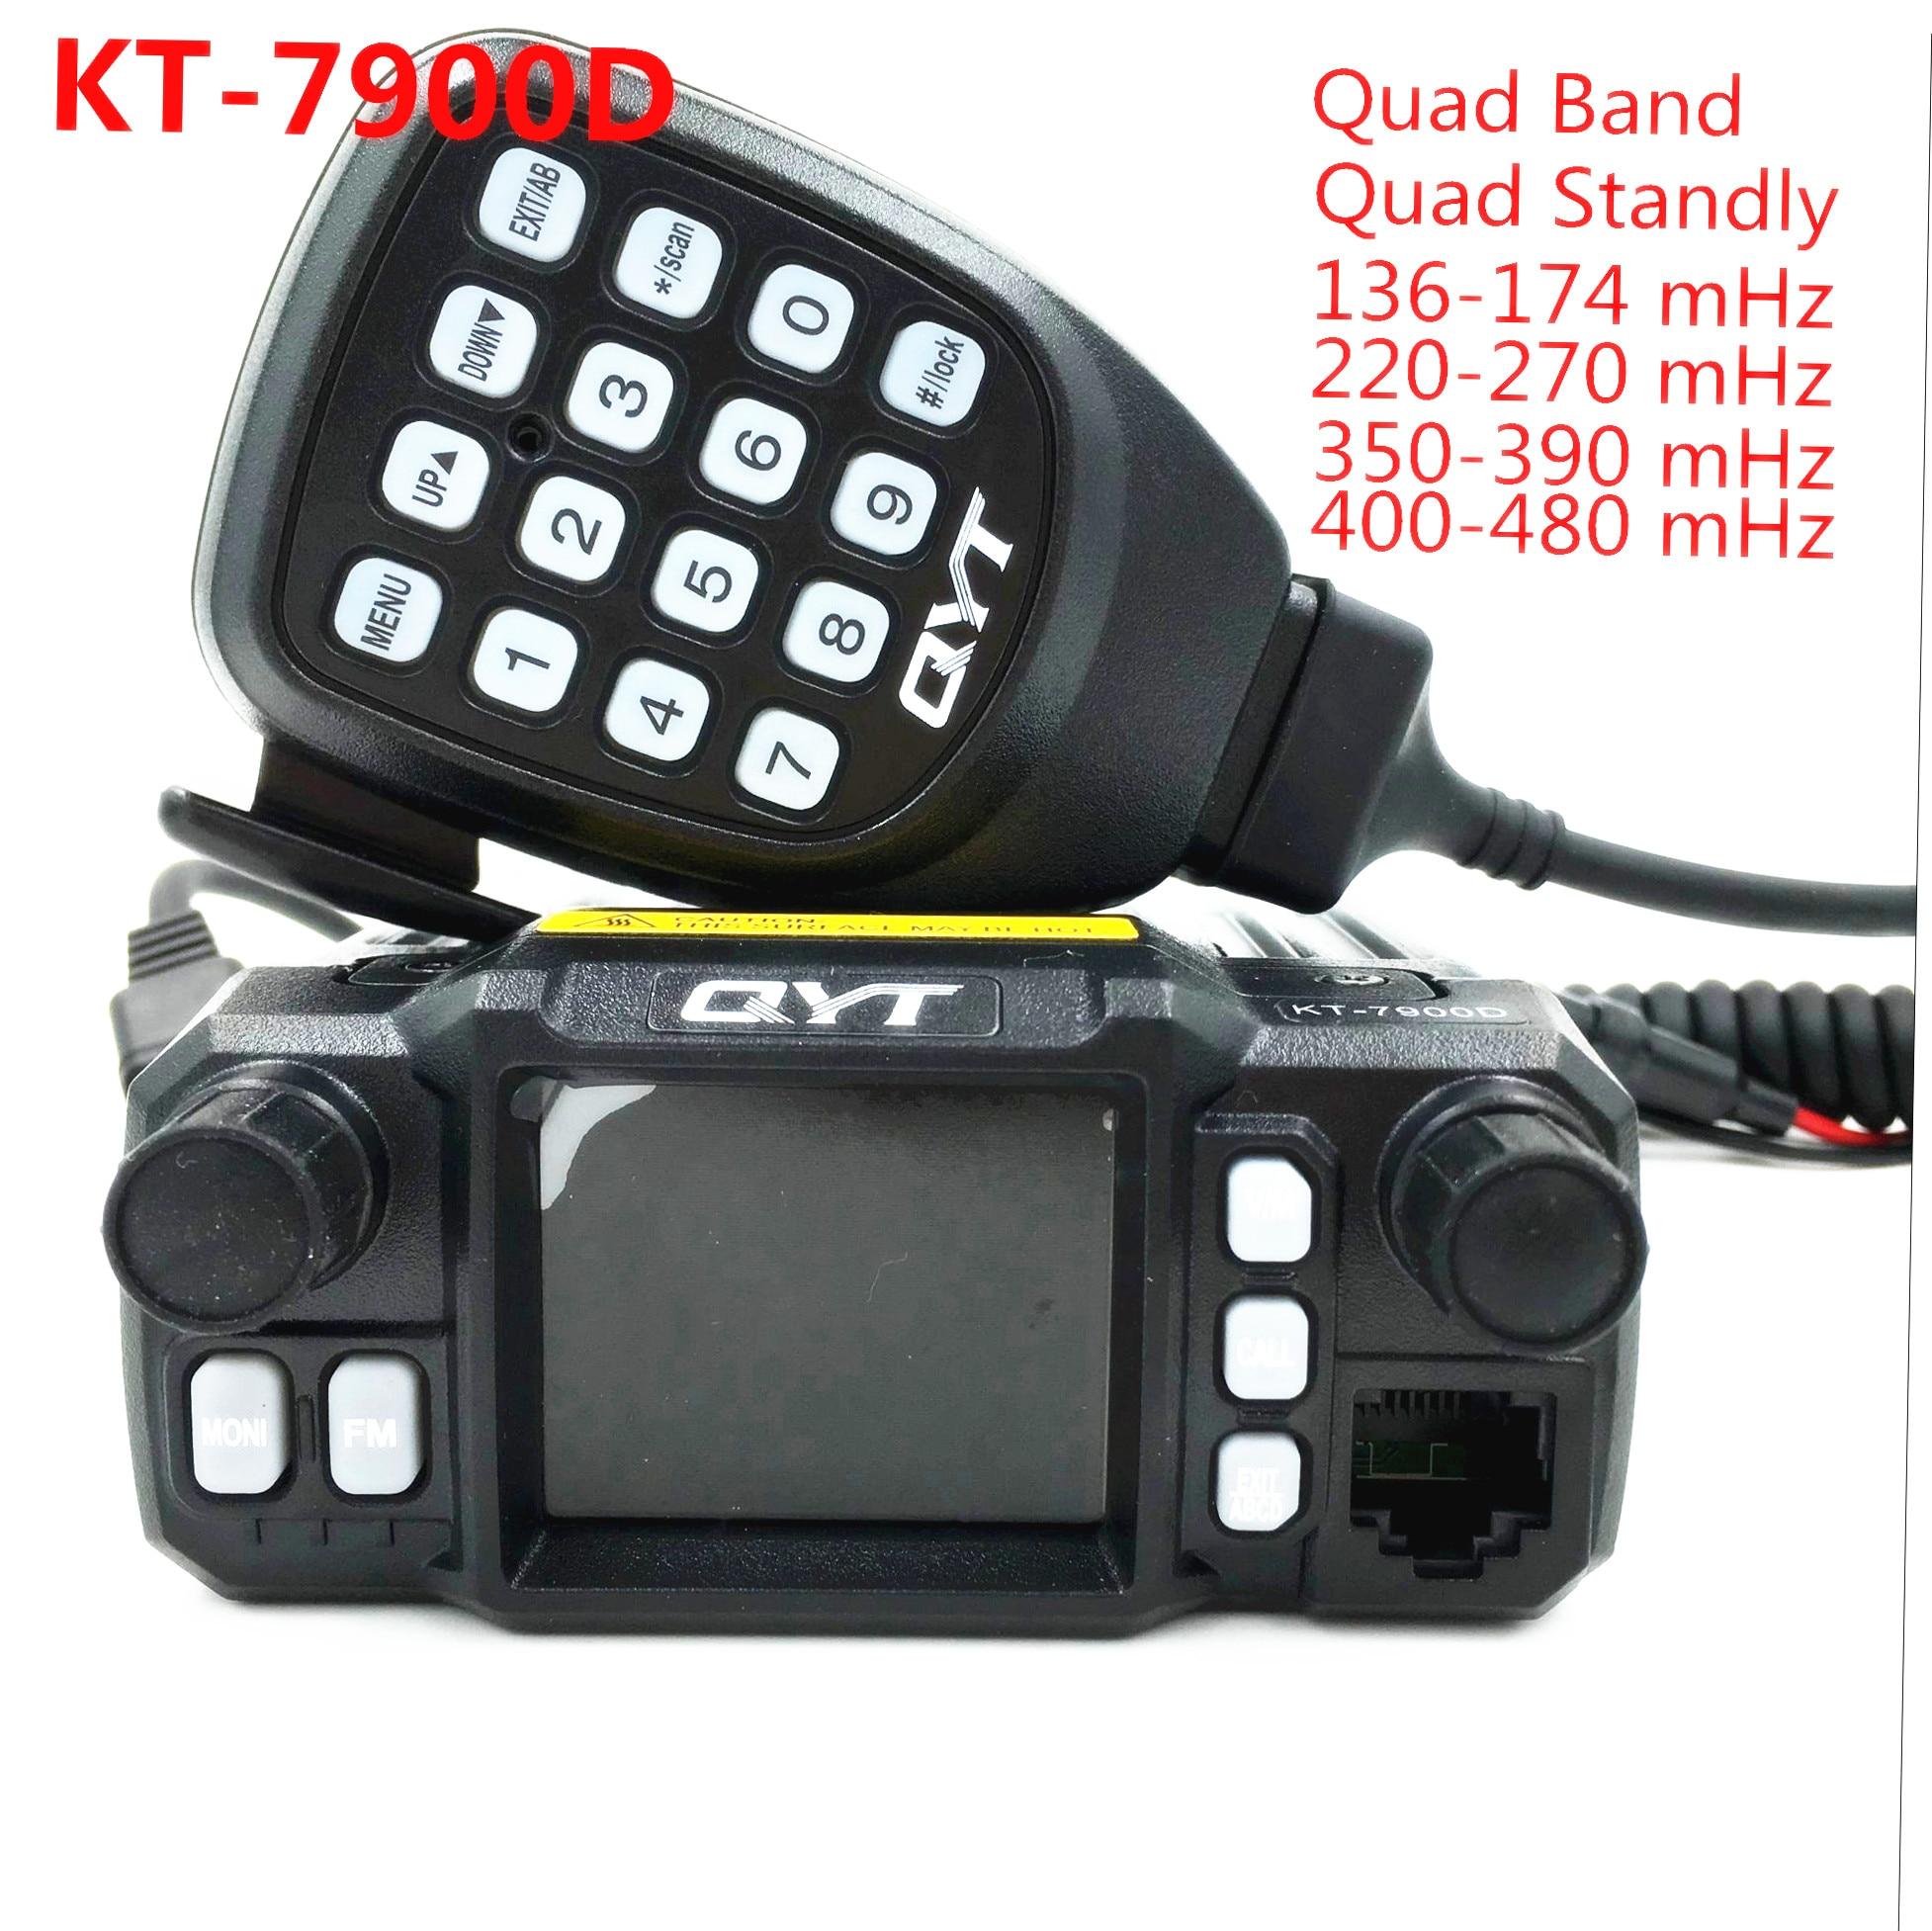 QYT KT-7900D 25W Quad Band Mobile Radio Transceiver 144/220/350/440MHZ 25W Ham Car Mobile Radio